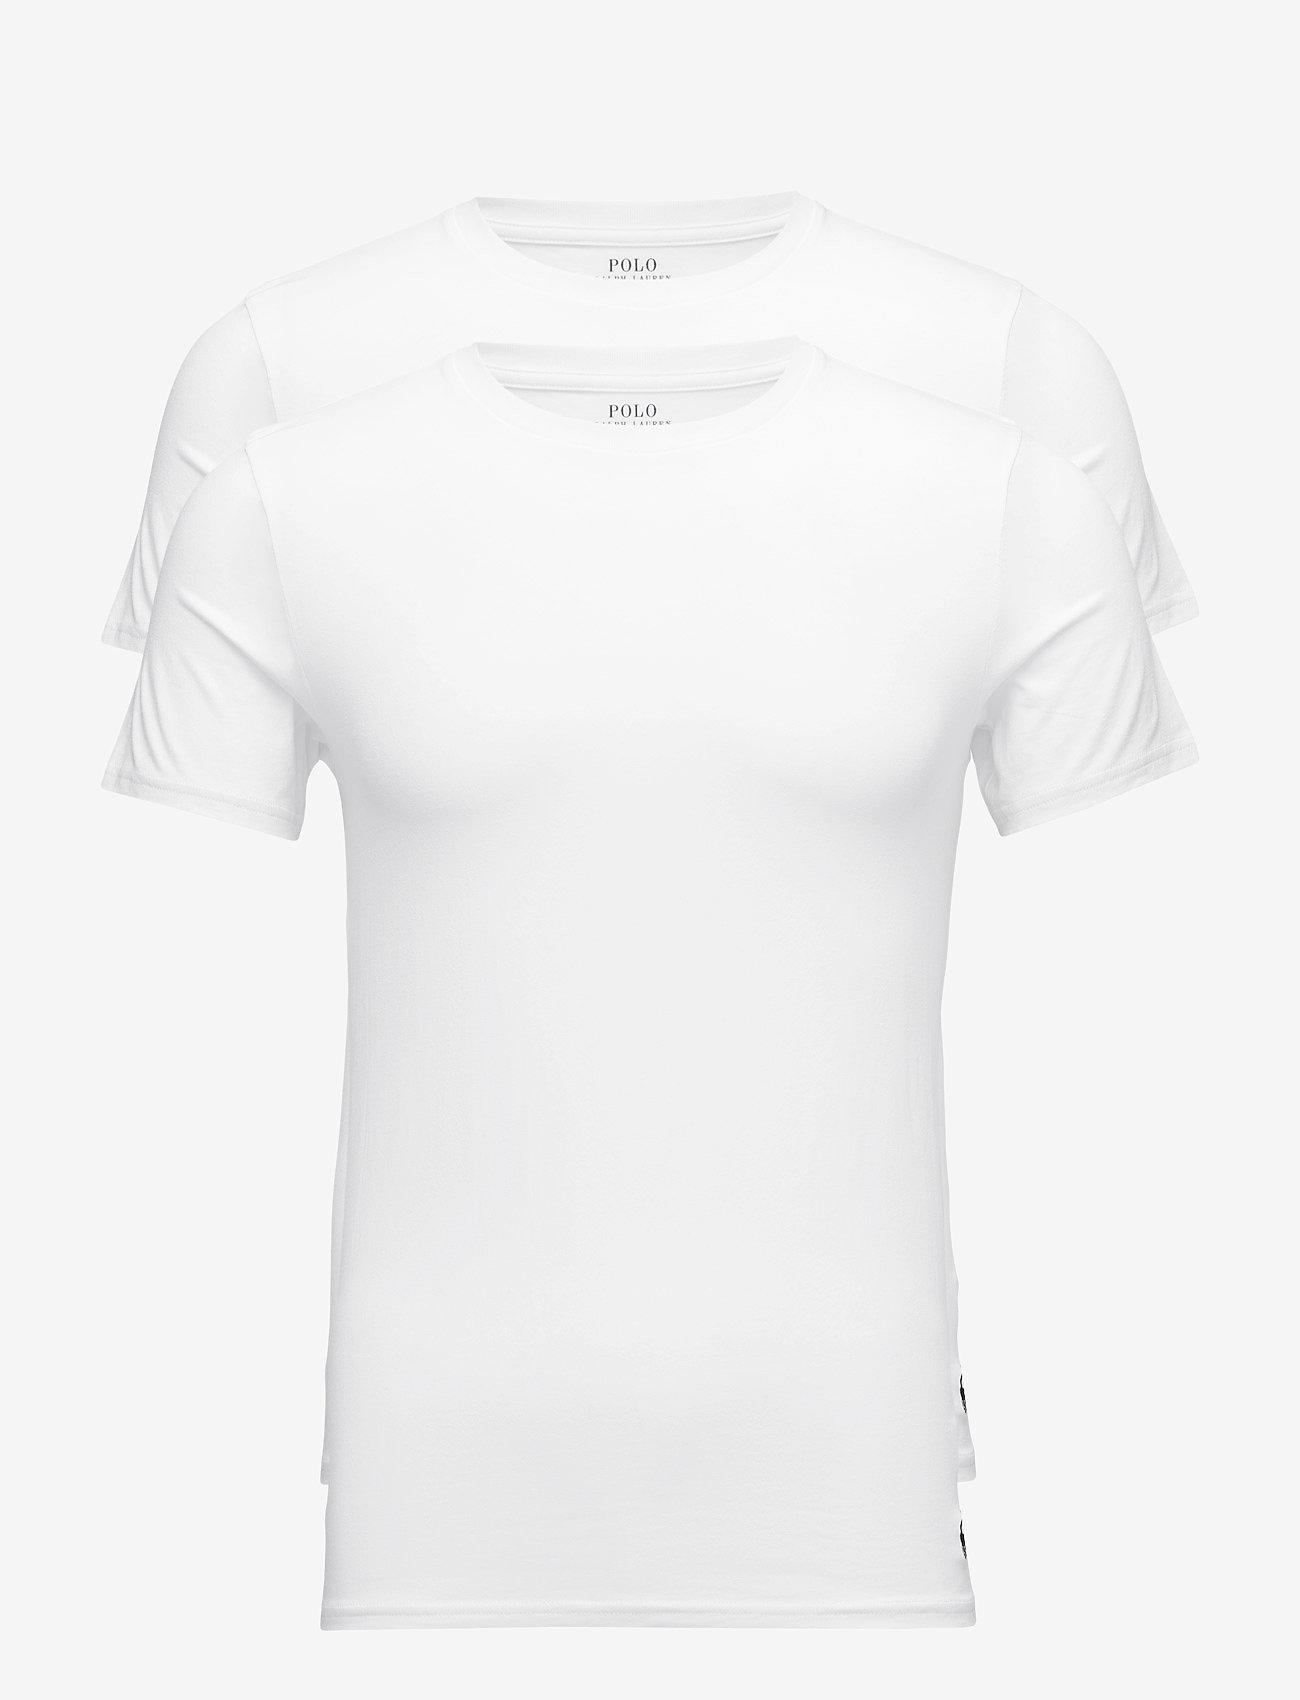 Polo Ralph Lauren Underwear - Crewneck T-Shirt 2-Pack - multipack - 2pk white/white - 0